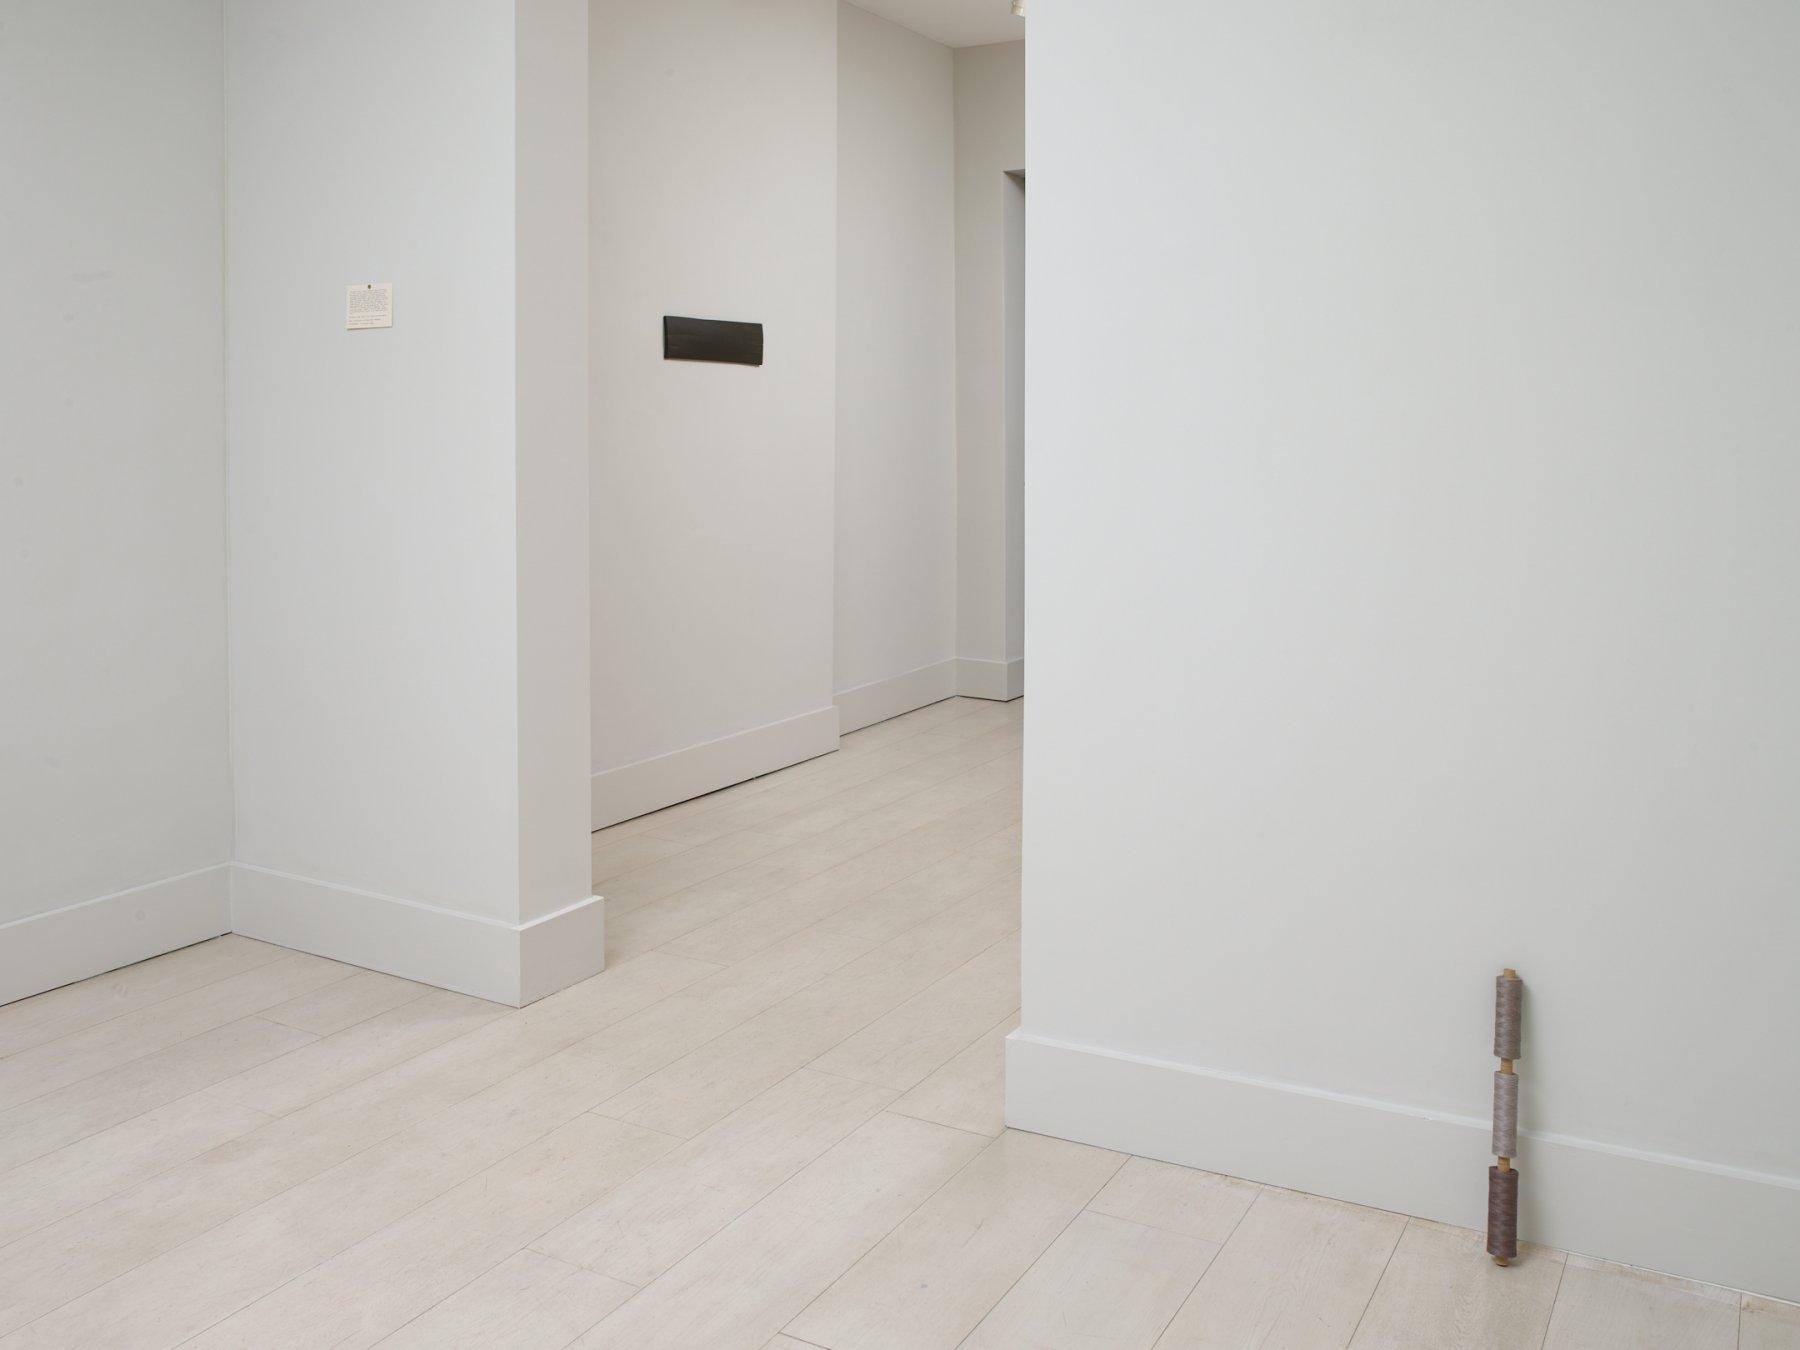 Large Glass Helen Mirra 1